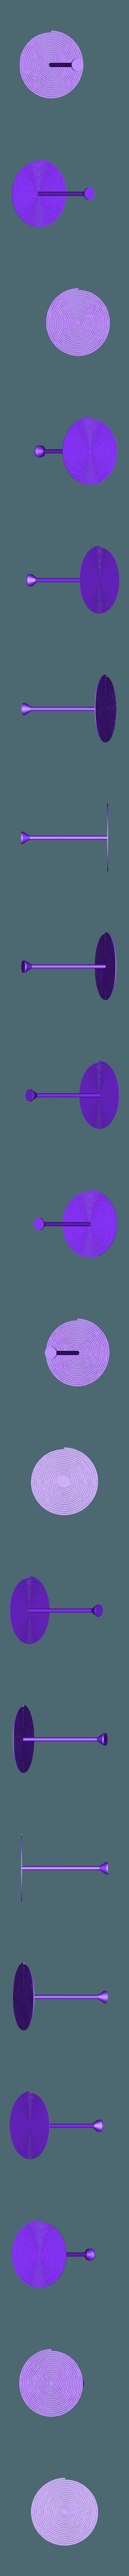 80mm_Spiral_Tree.stl Download free SCAD file Customizable Spiral Tree • Design to 3D print, WalterHsiao